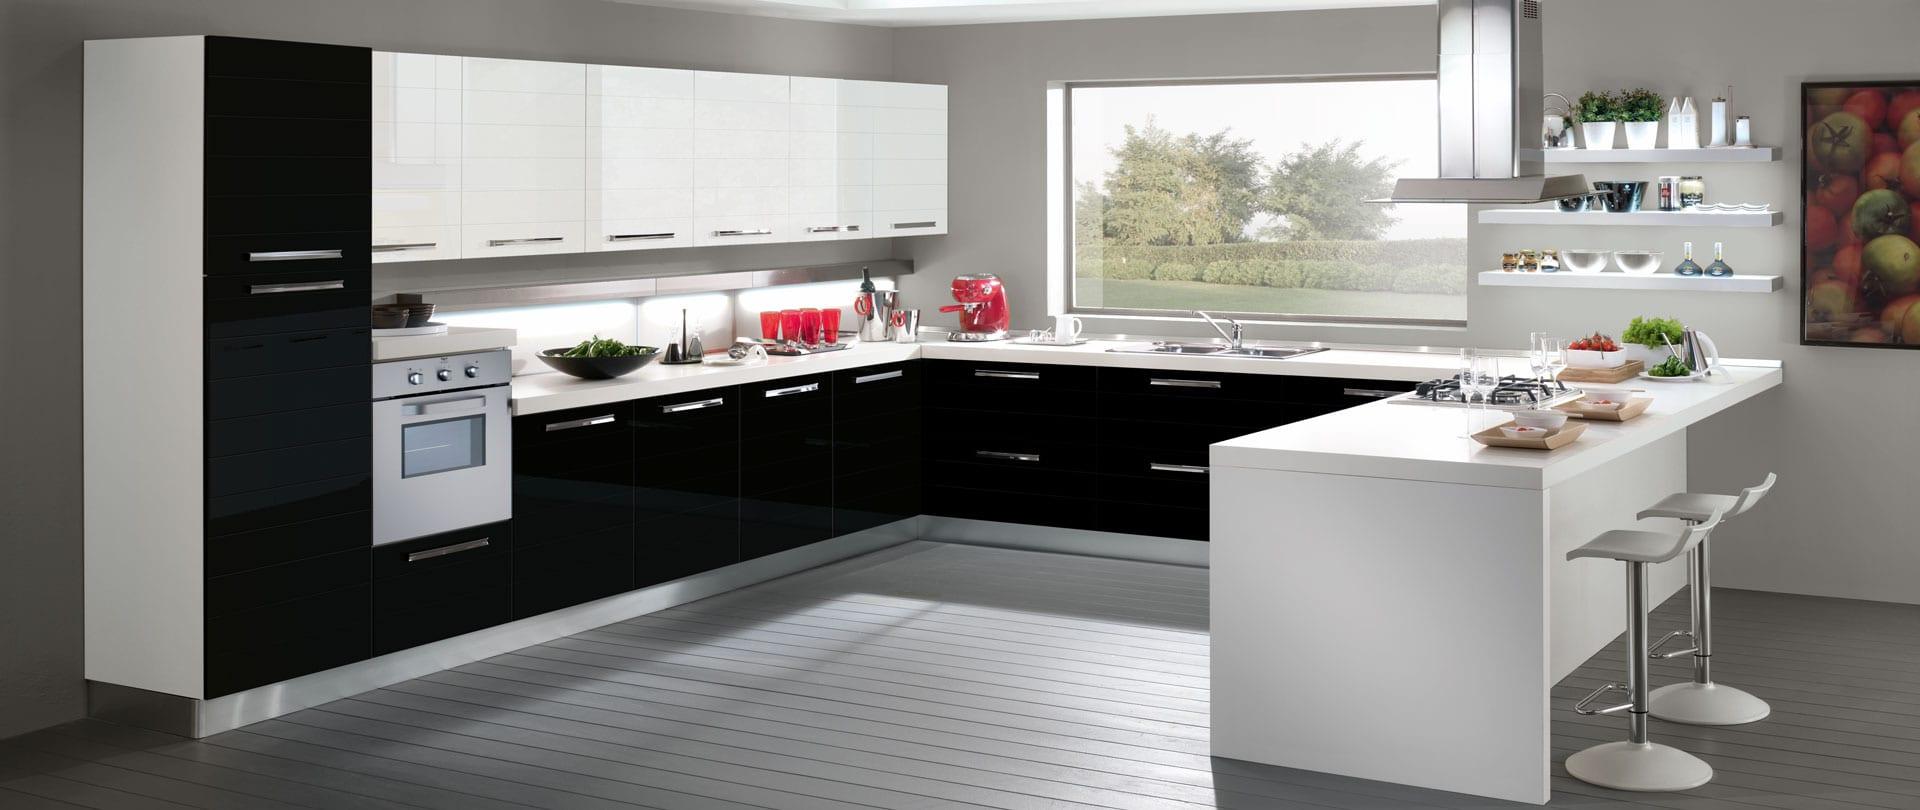 08-cucina-moderna-egle-nero_bianco